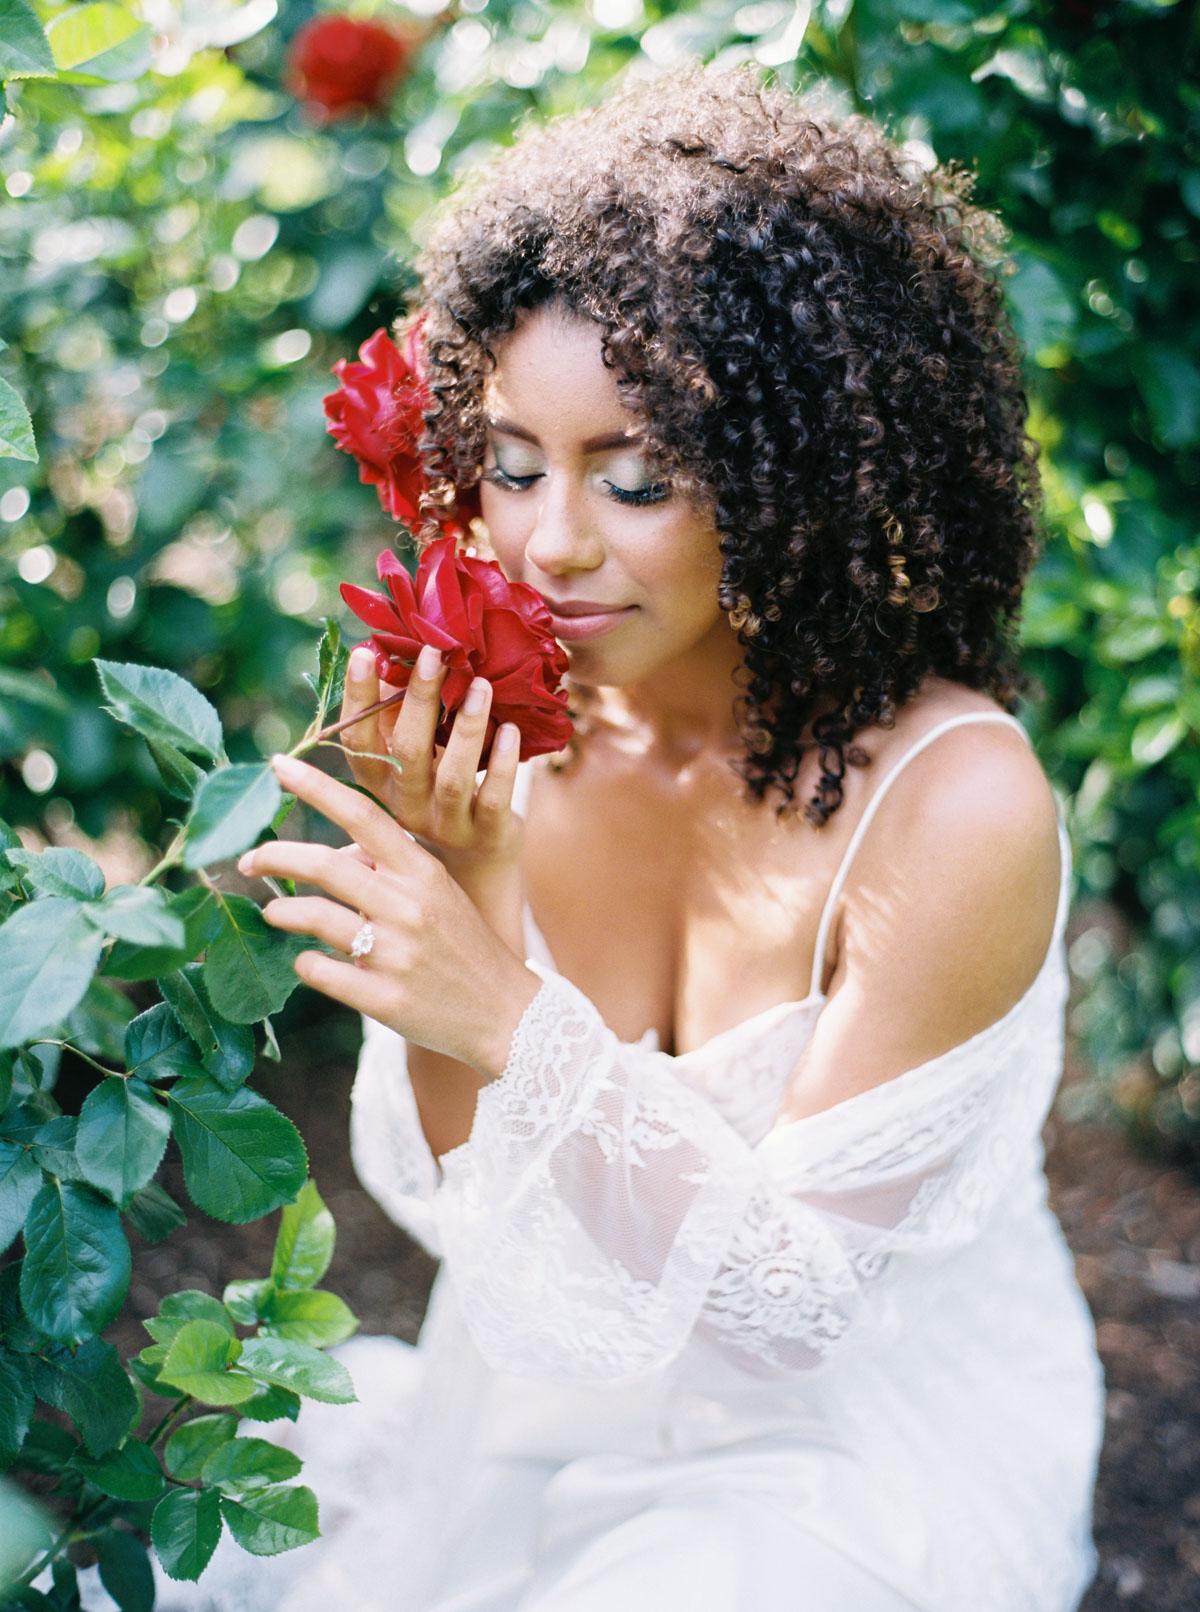 Stanley Park Rose Garden Portraits